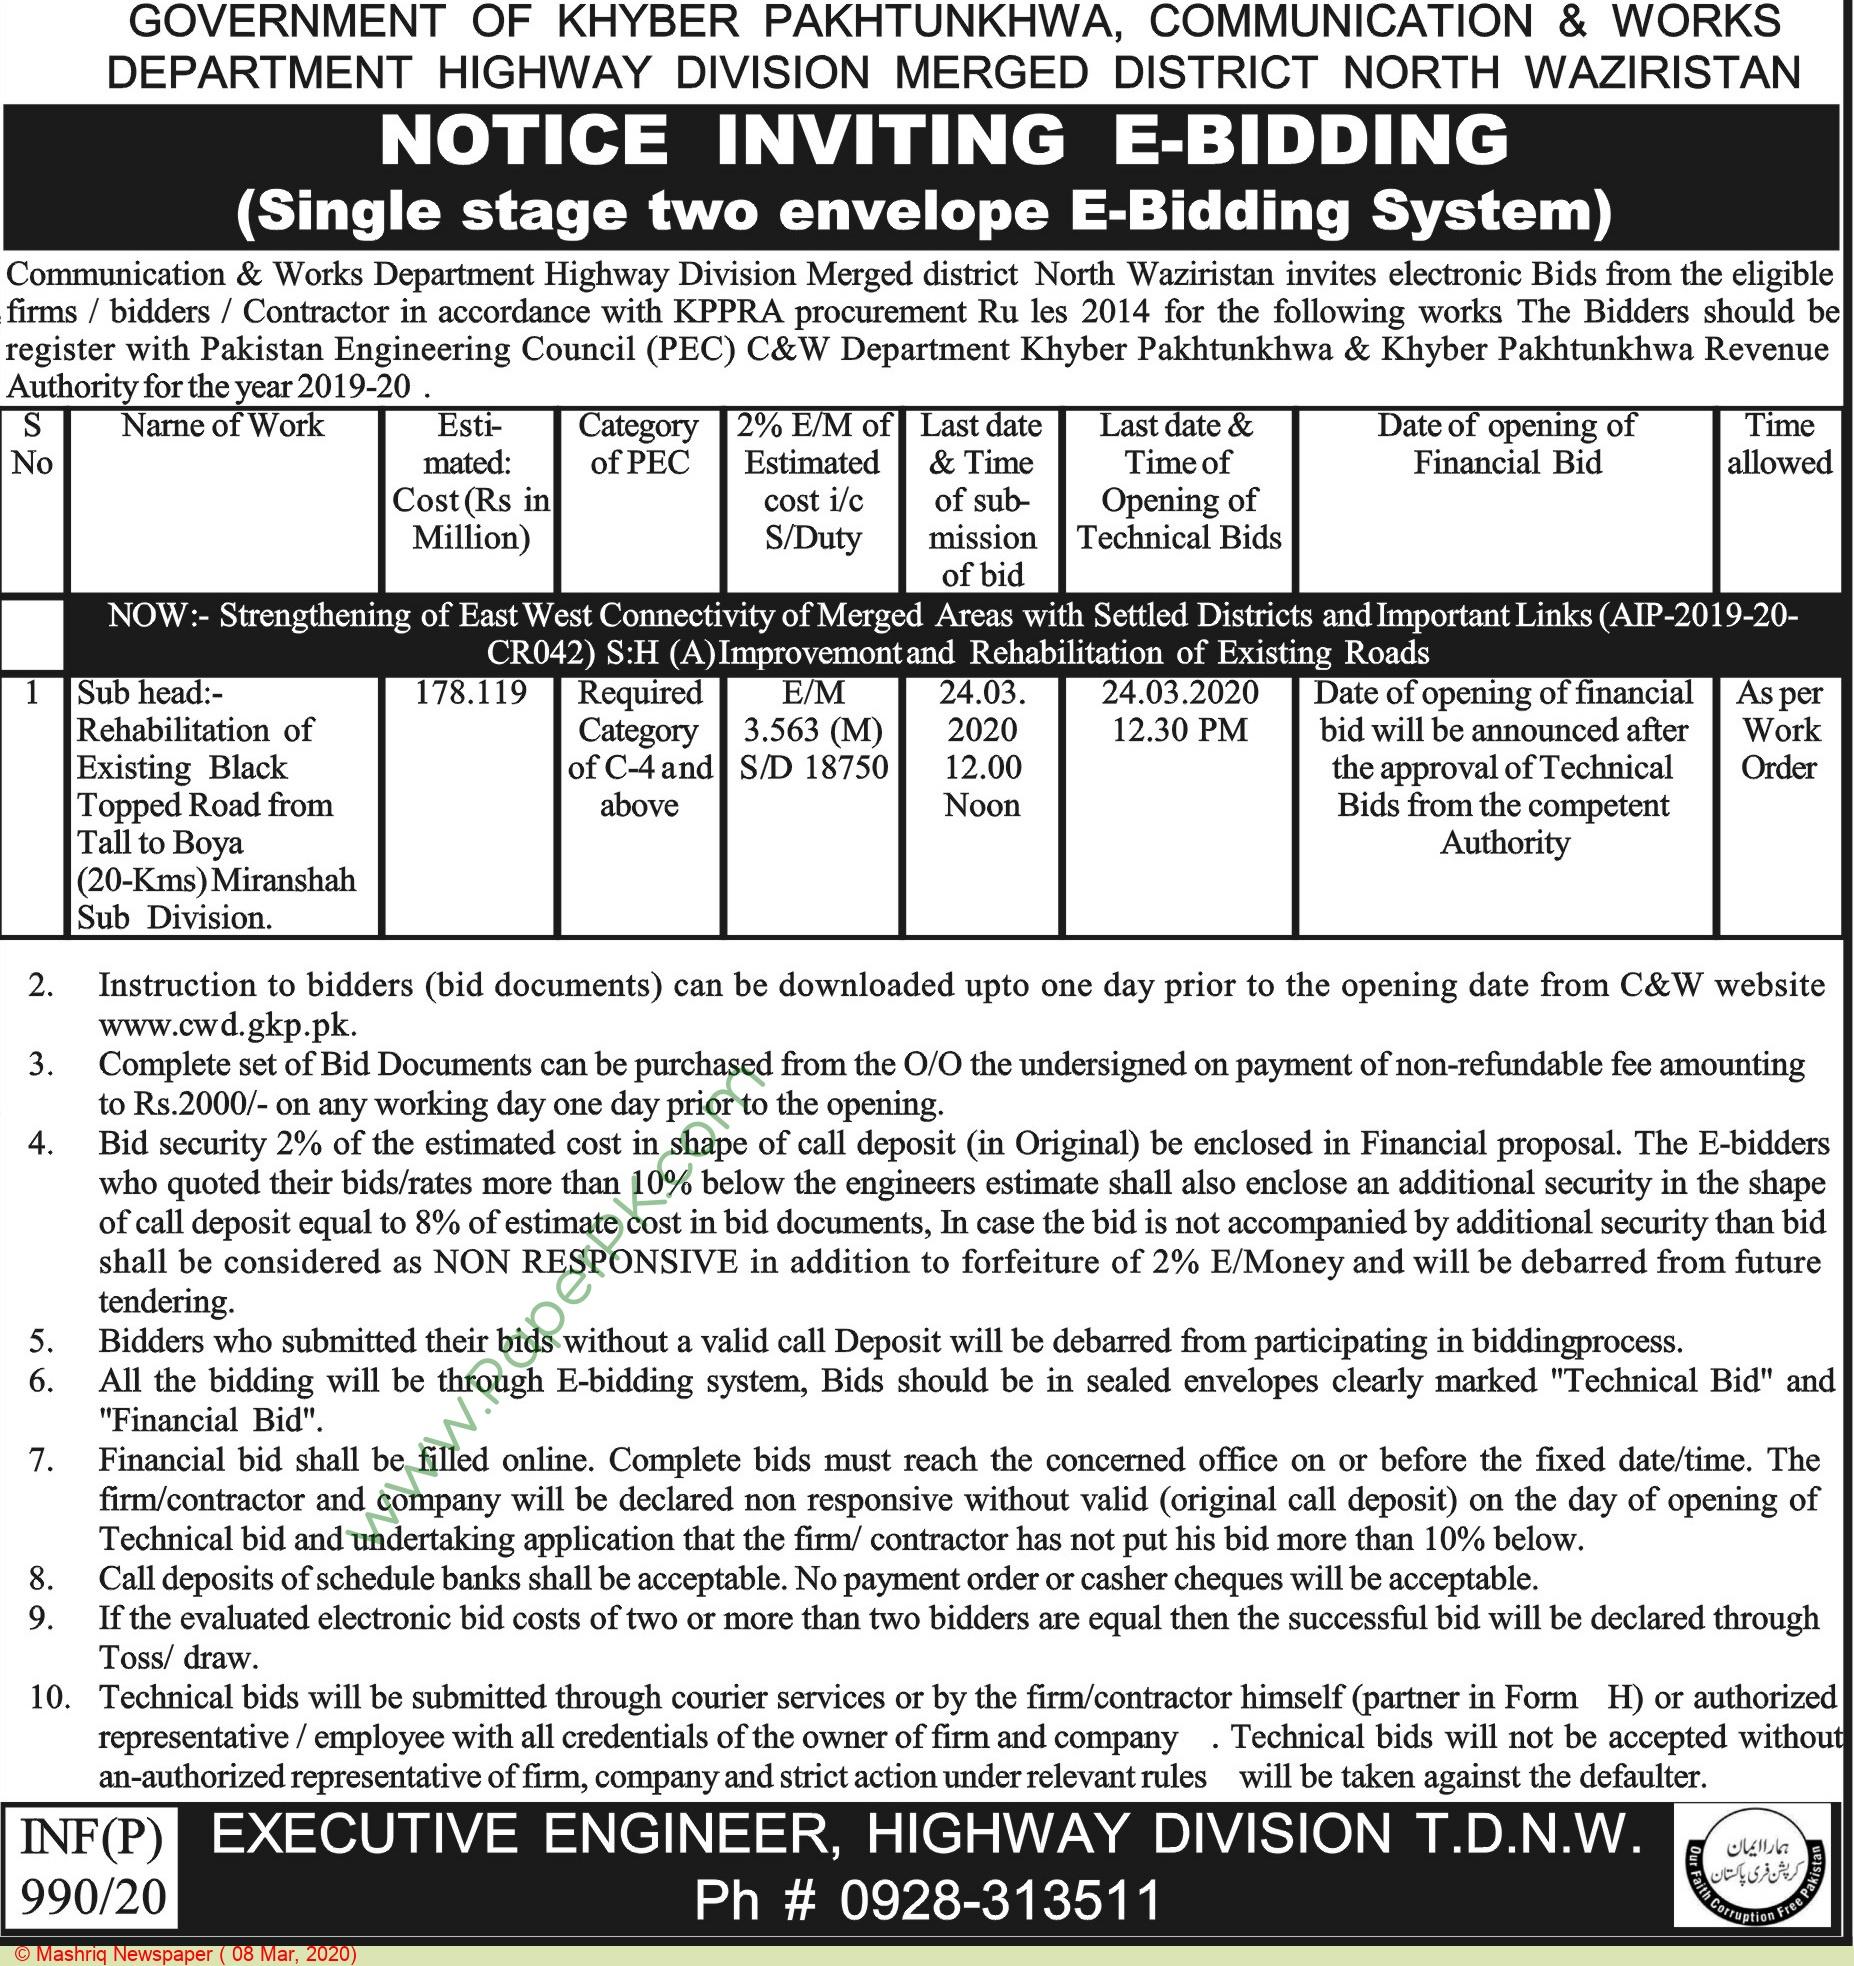 Highway Division North Waziristan Tender Notice